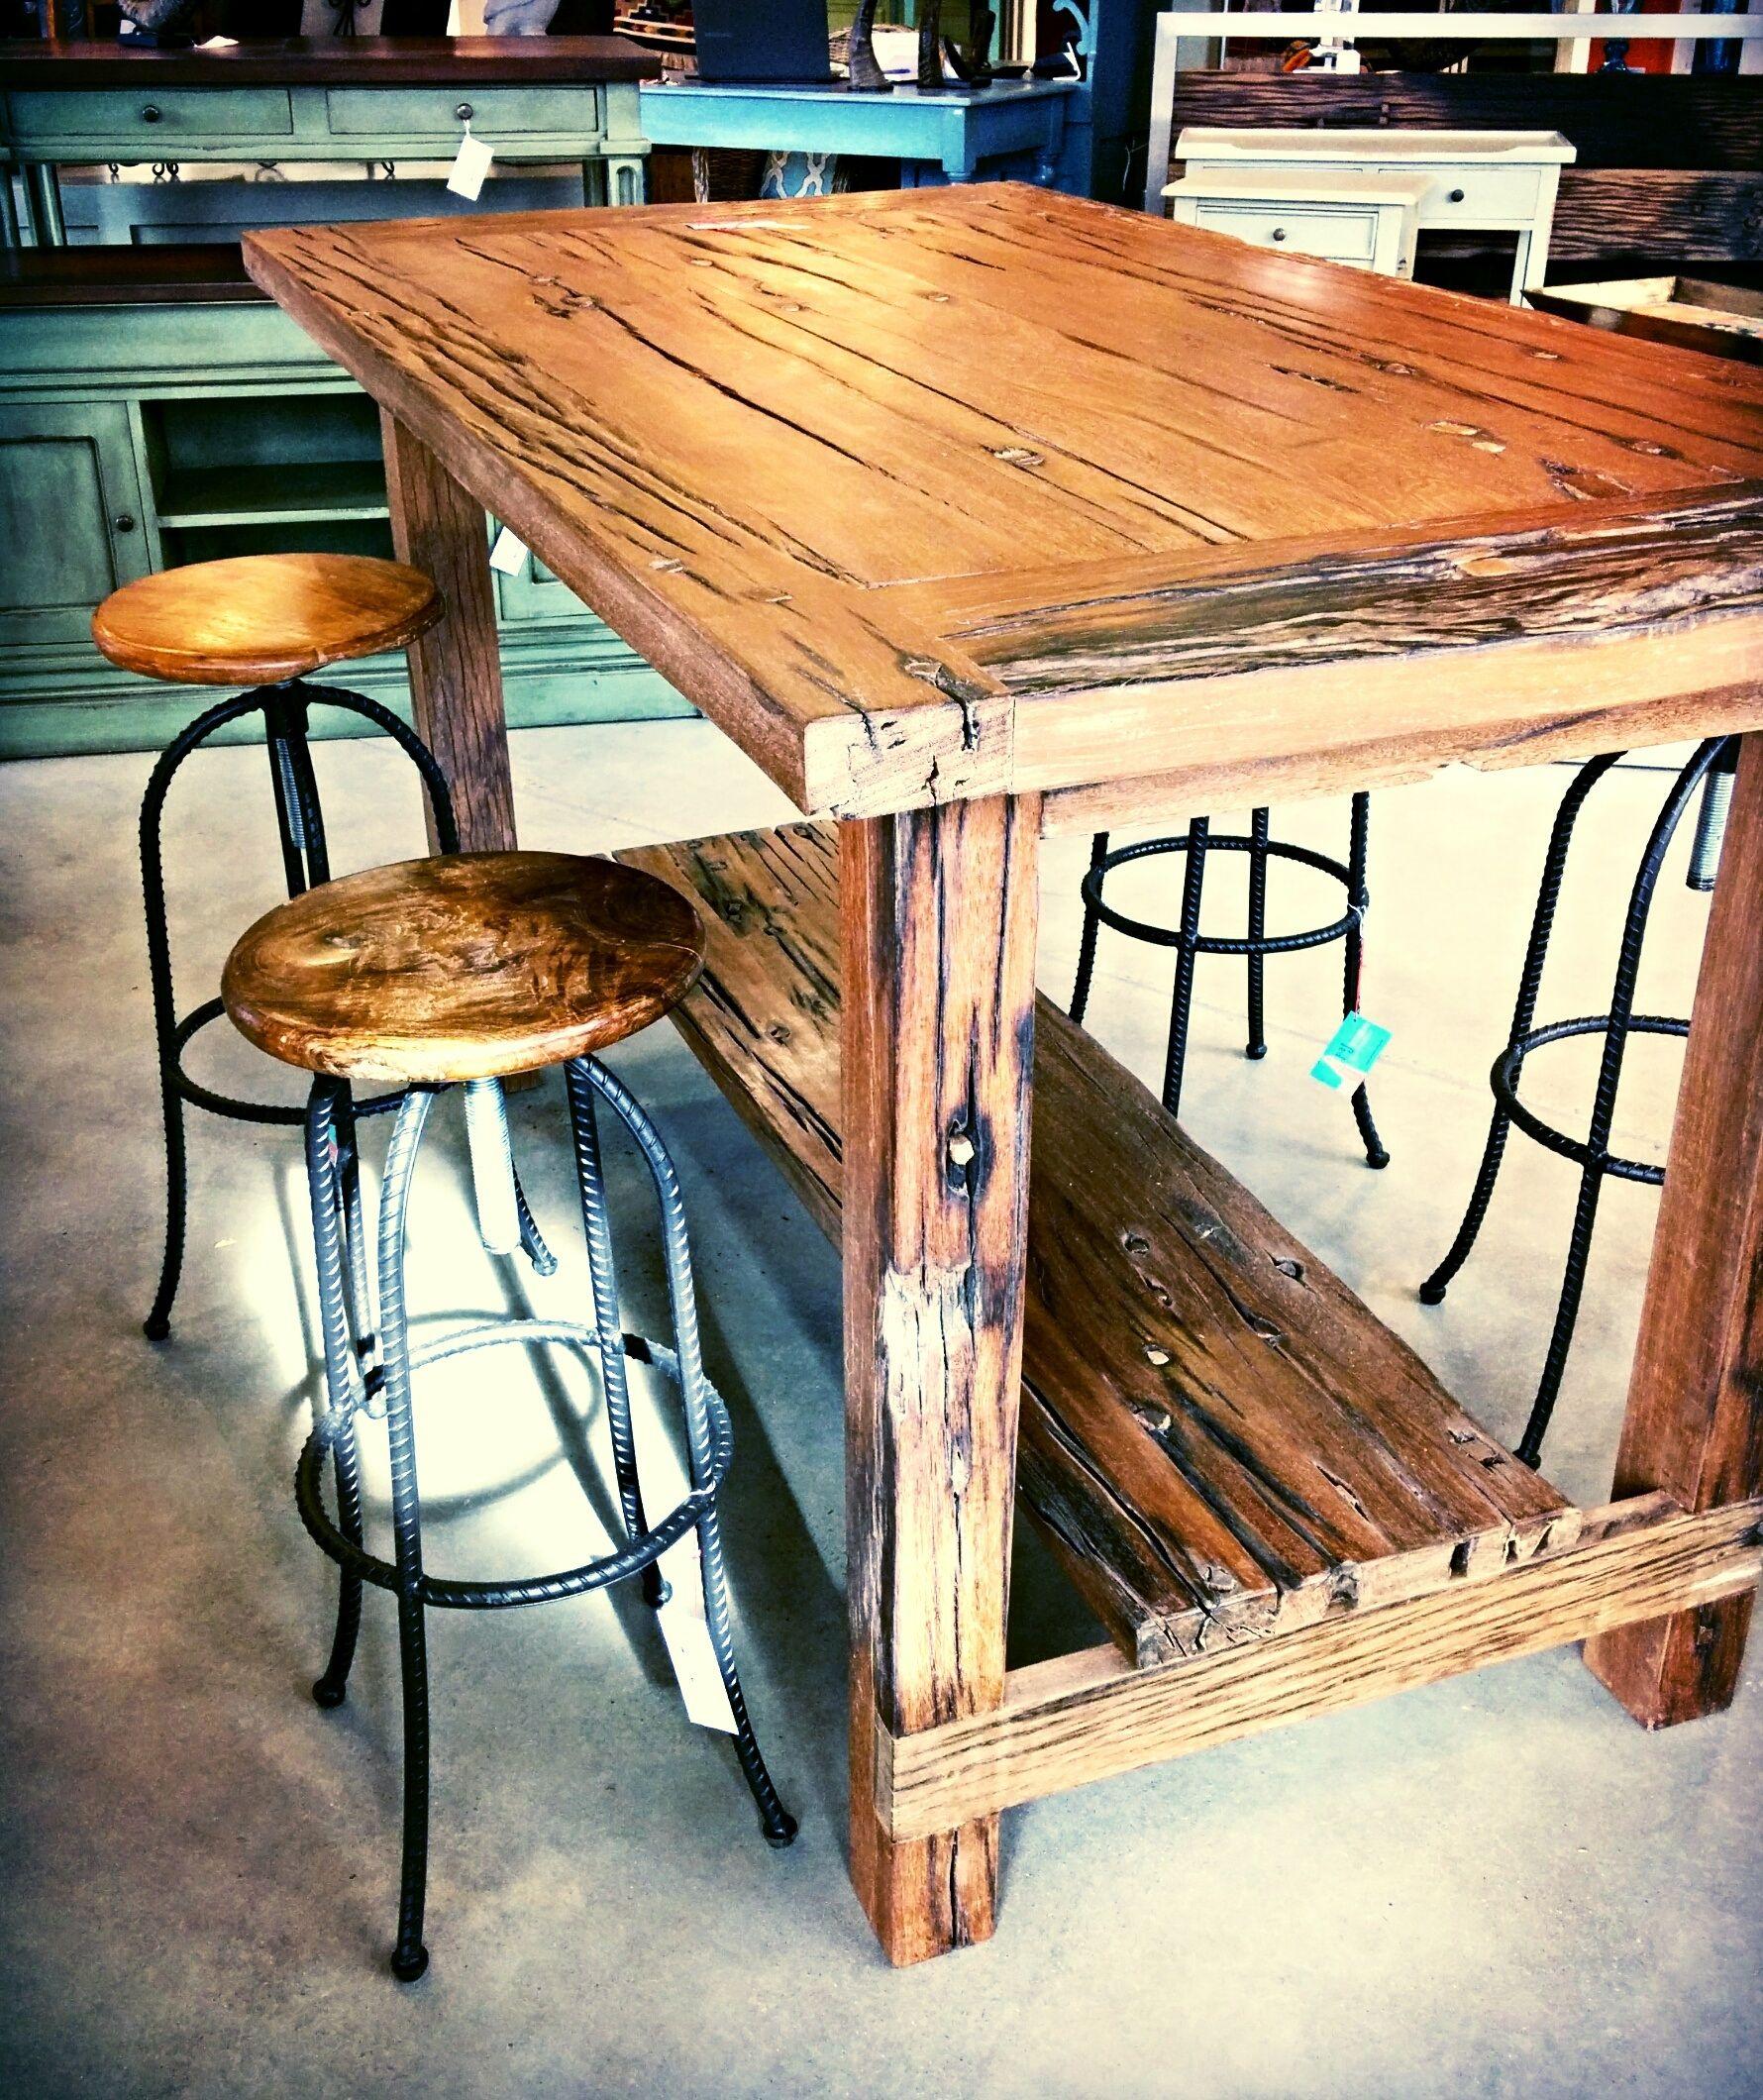 Beautiful Al Natural Hand Crafted Wood. Refurbished From Railroad Ties. Paj  Furniture, Salt